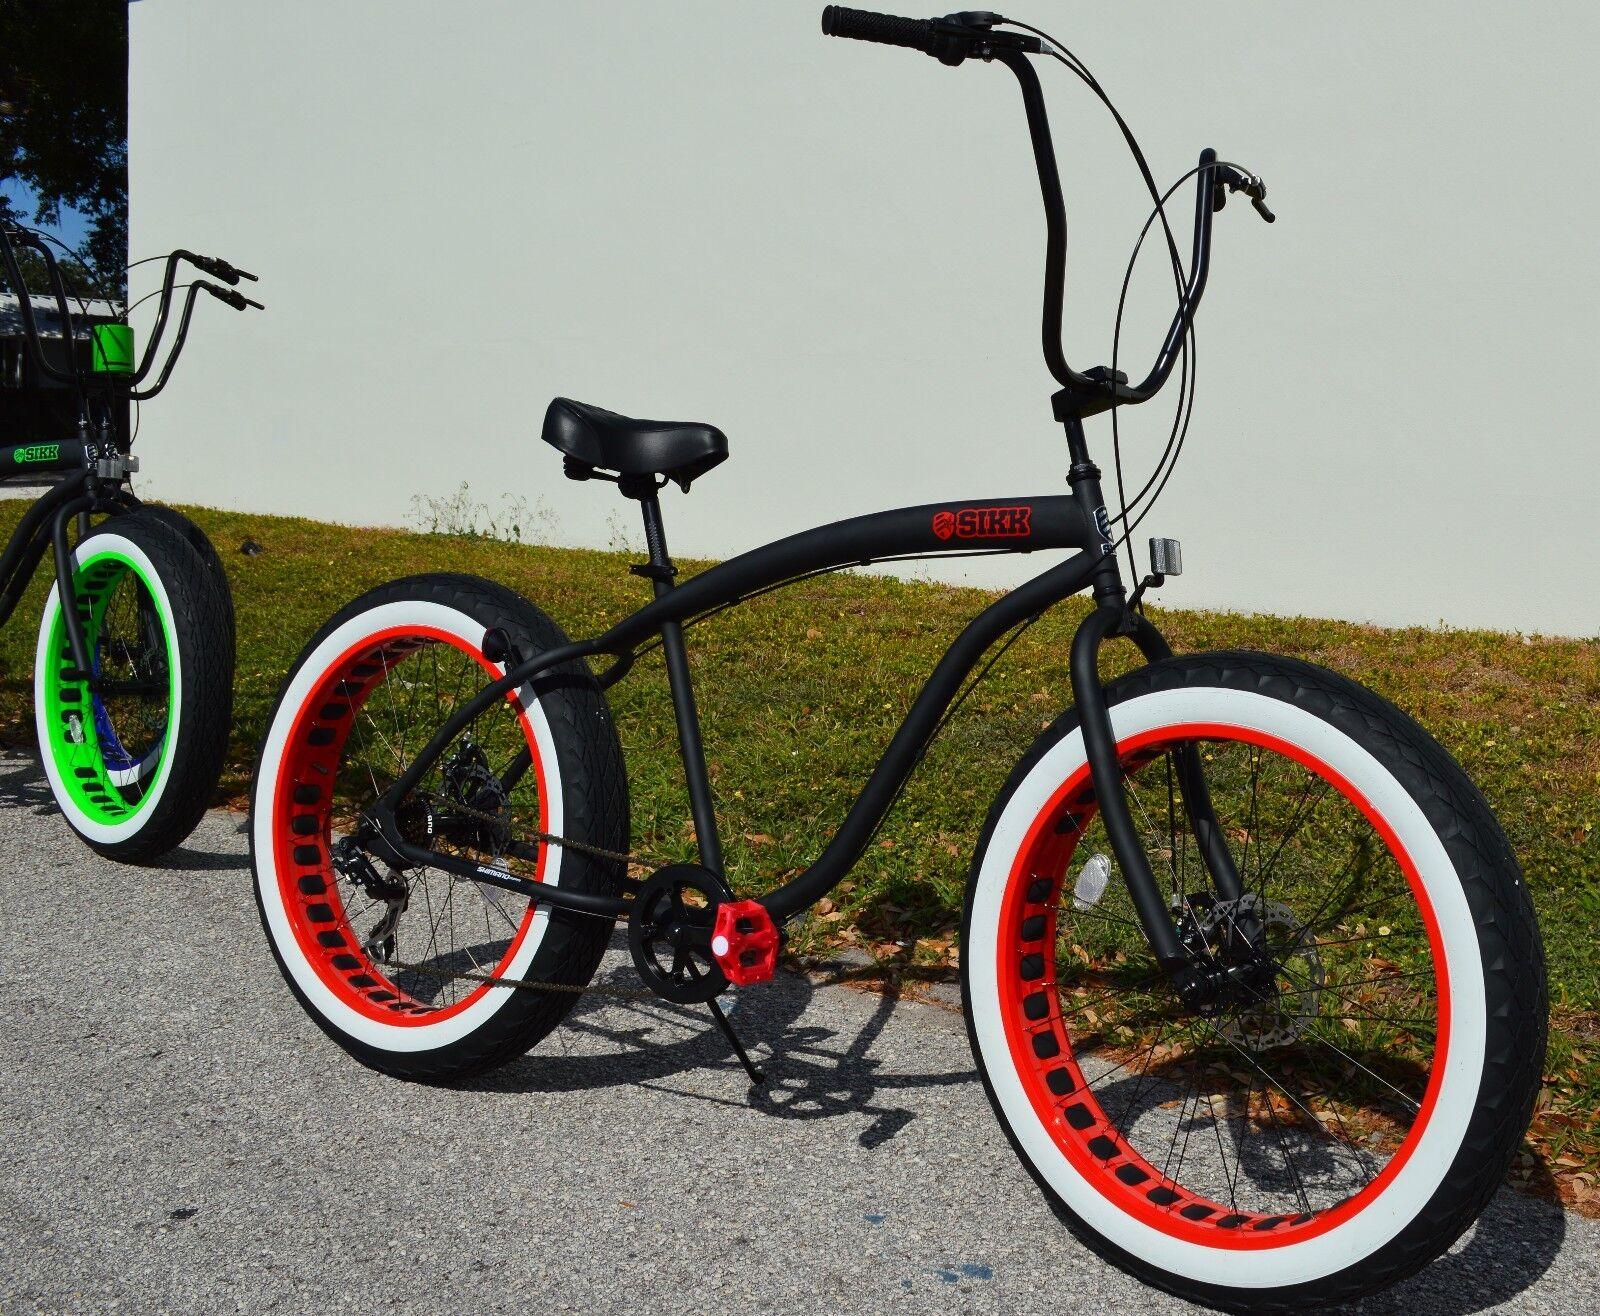 Fat Tire Beach Cruiser Bike ?? SIKK Black w Red Rim WW Tires 7 SPEED-CUTOUT RIMS